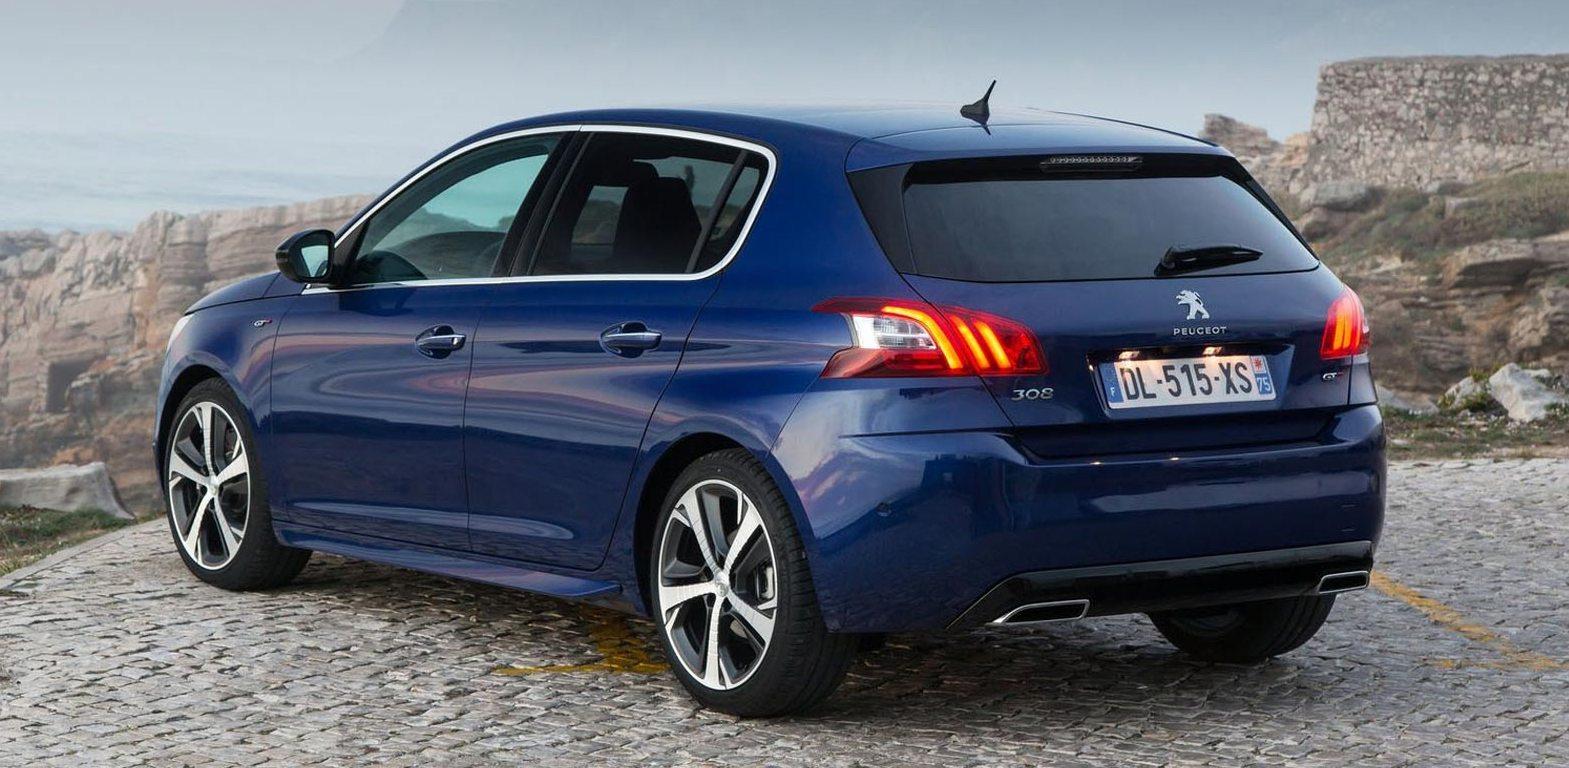 samye-ekonomnye-avtomobili-po-rashodu-topliva-Peugeot-308-35-litra-na-100-km...